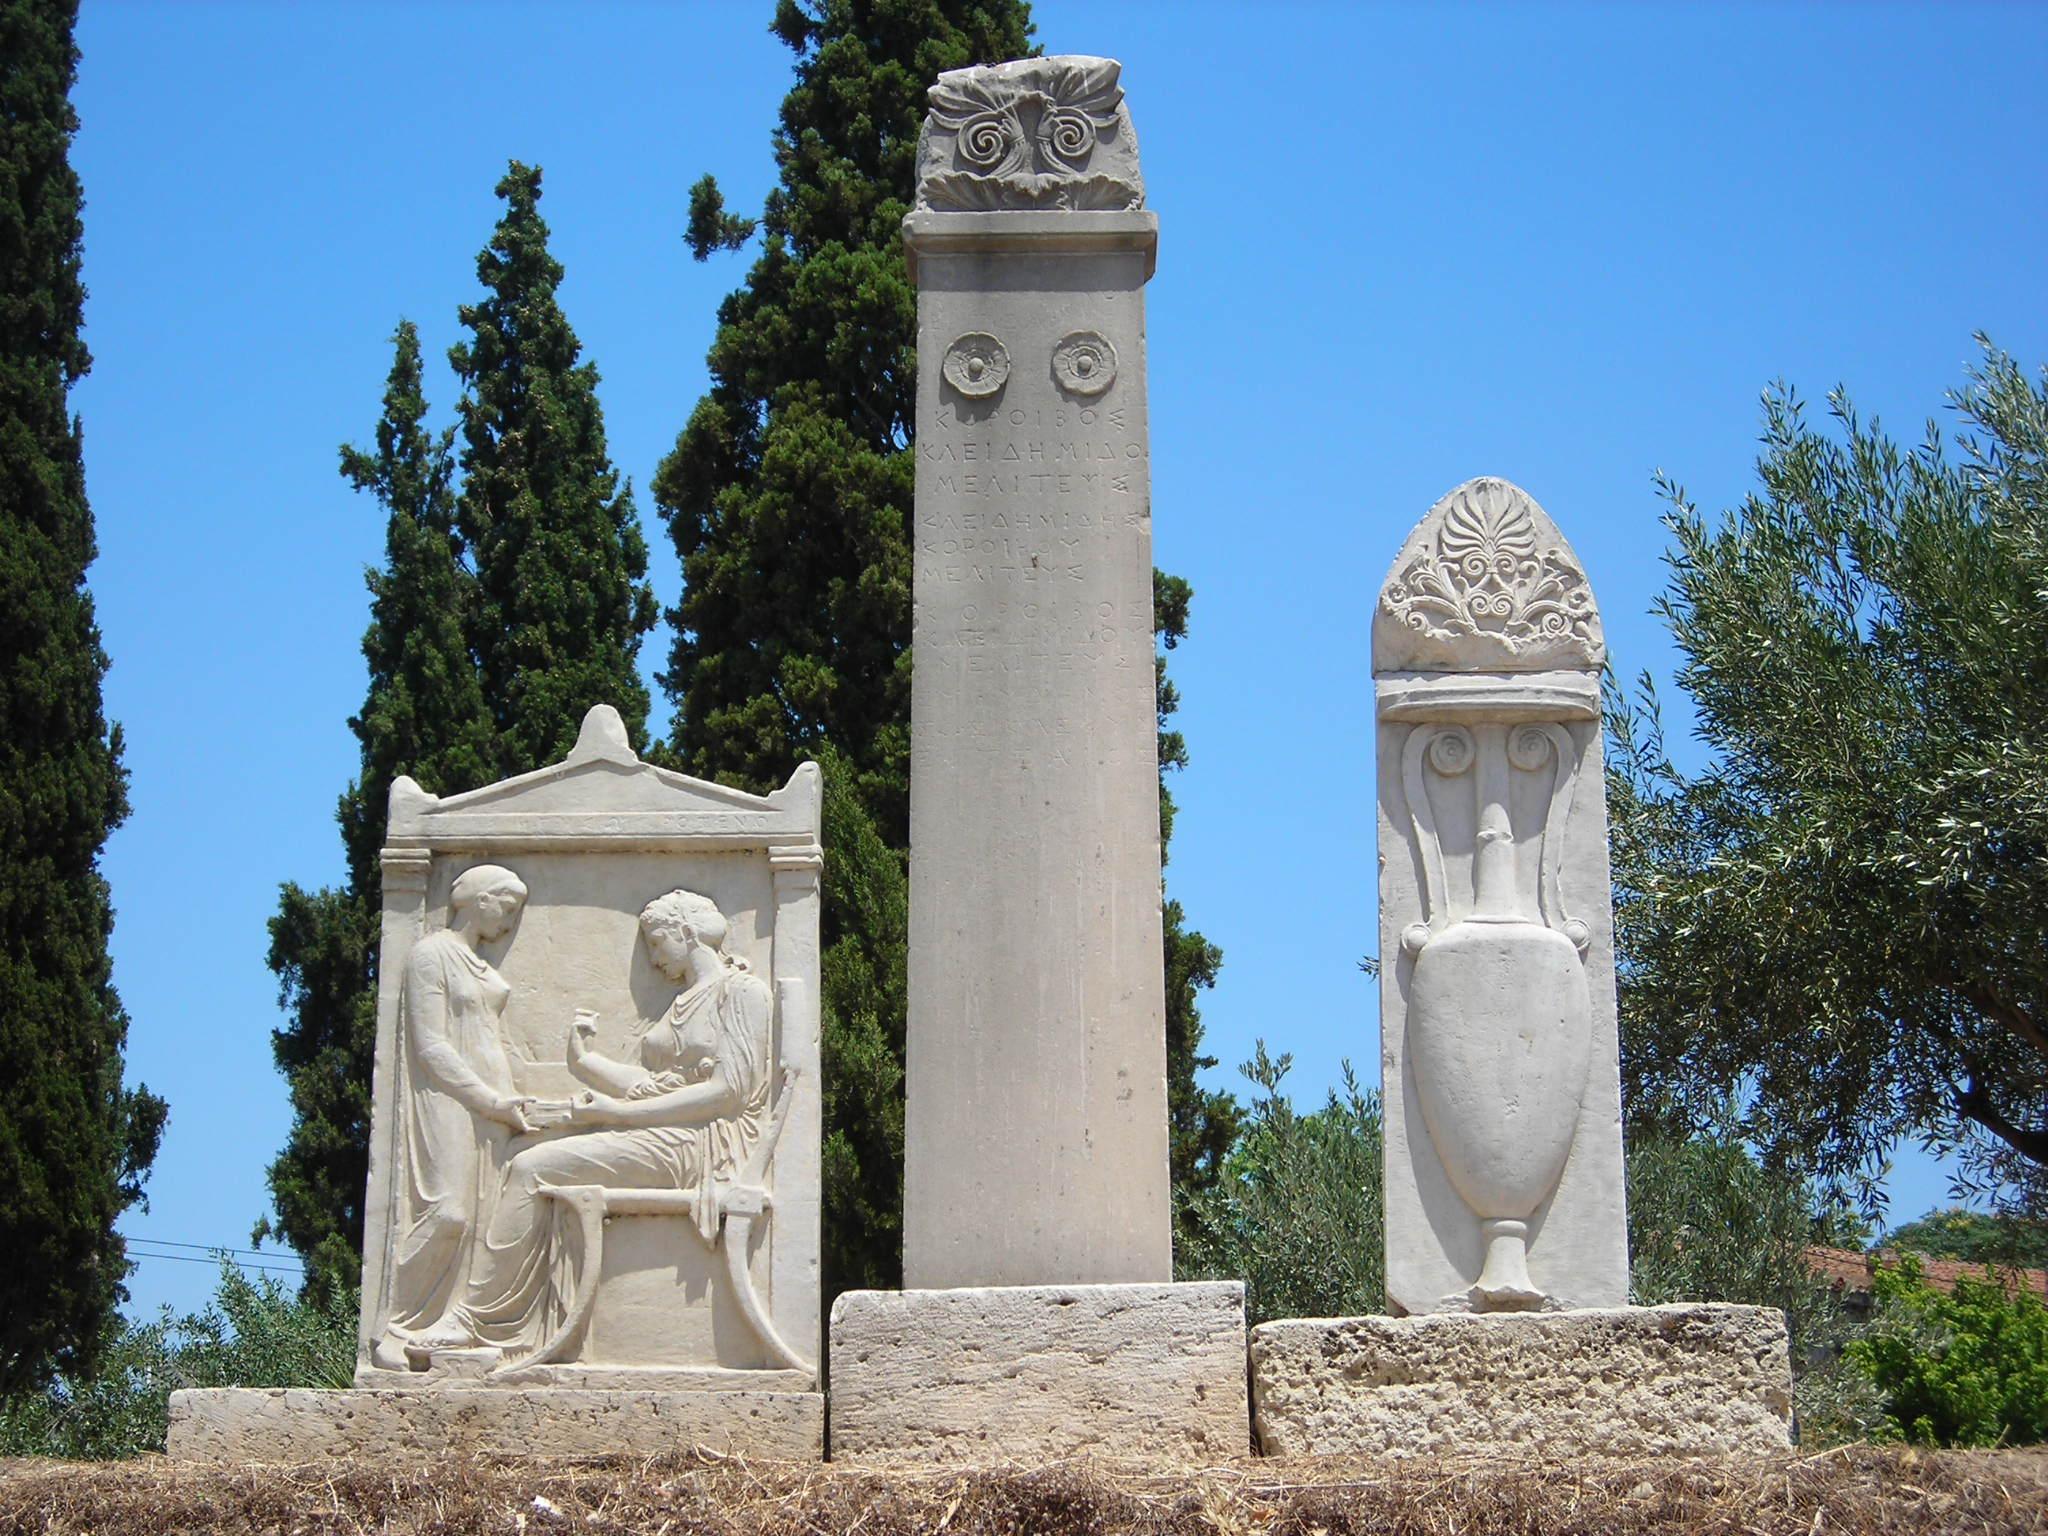 File:Kerameikos Tombs.jpg - Wikimedia Commons